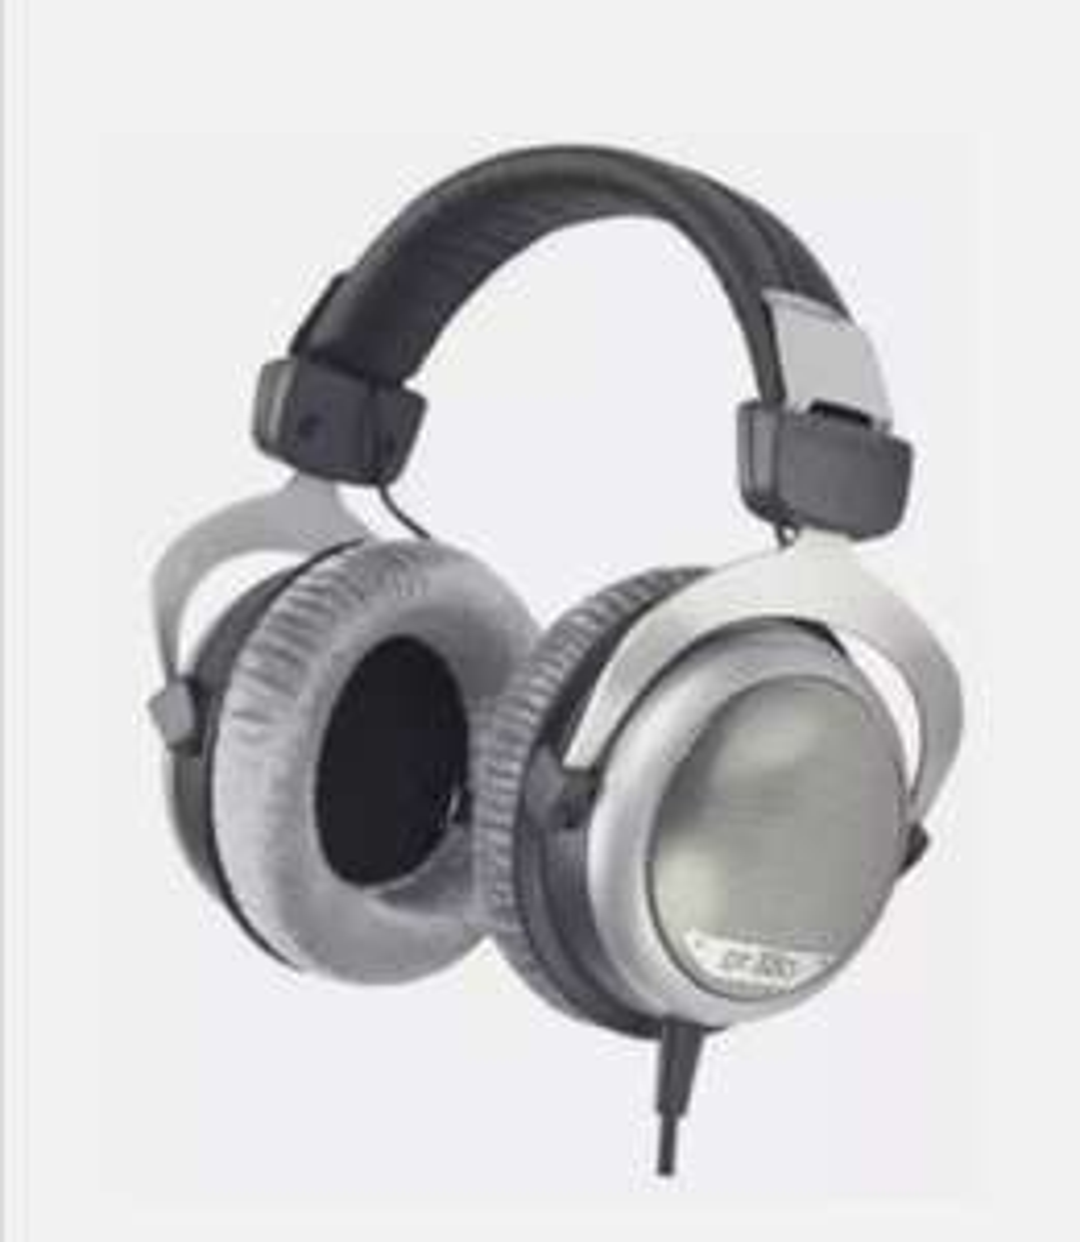 [eBay] beyerdynamic DT 880 Edition - 250 Ohm Kopfhörer / Headphones - Silber